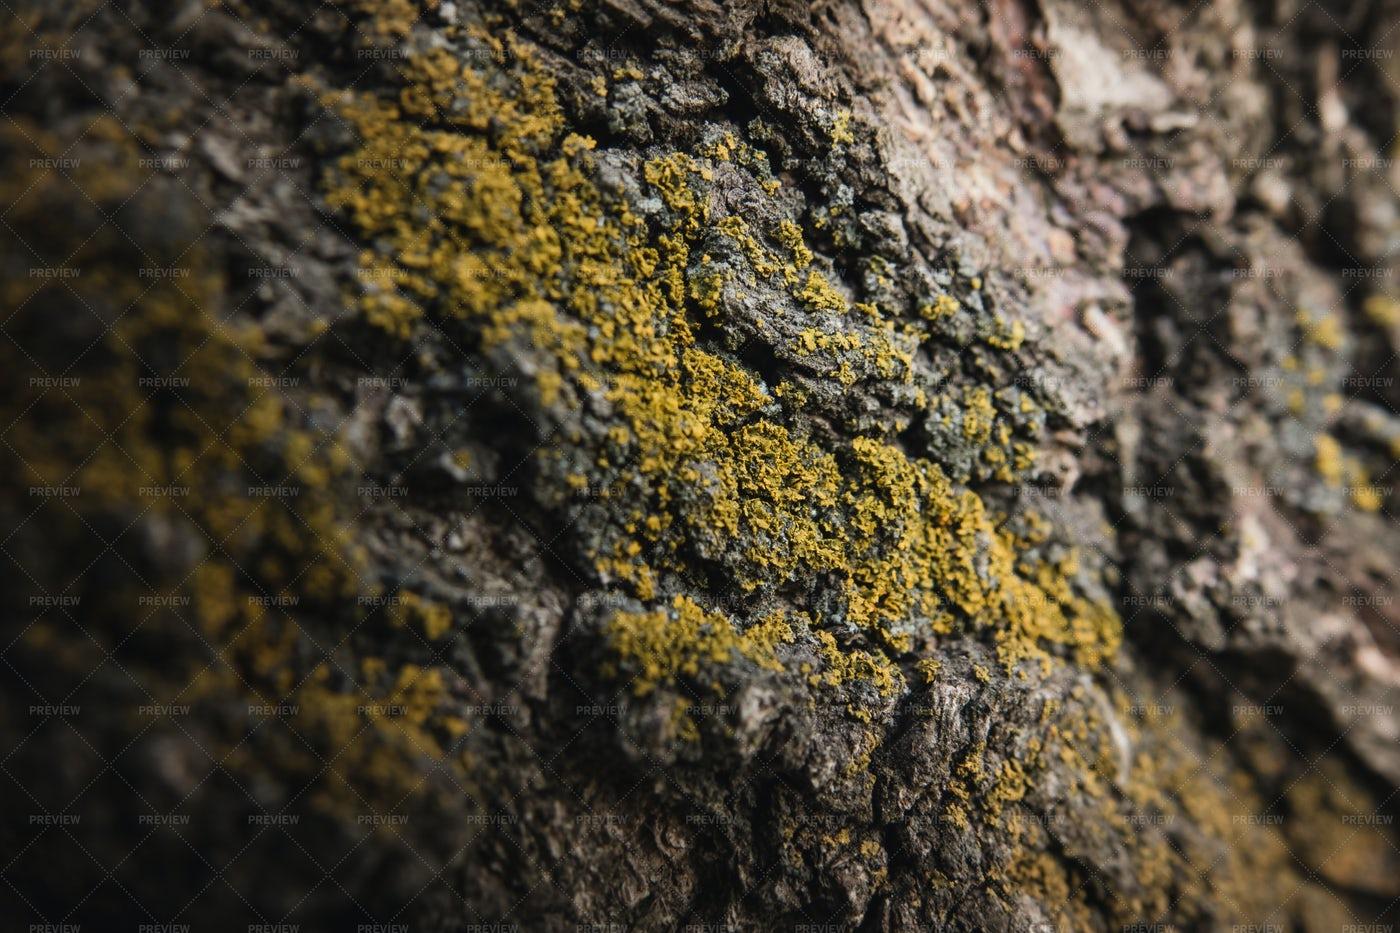 Tree Bark With Moss: Stock Photos